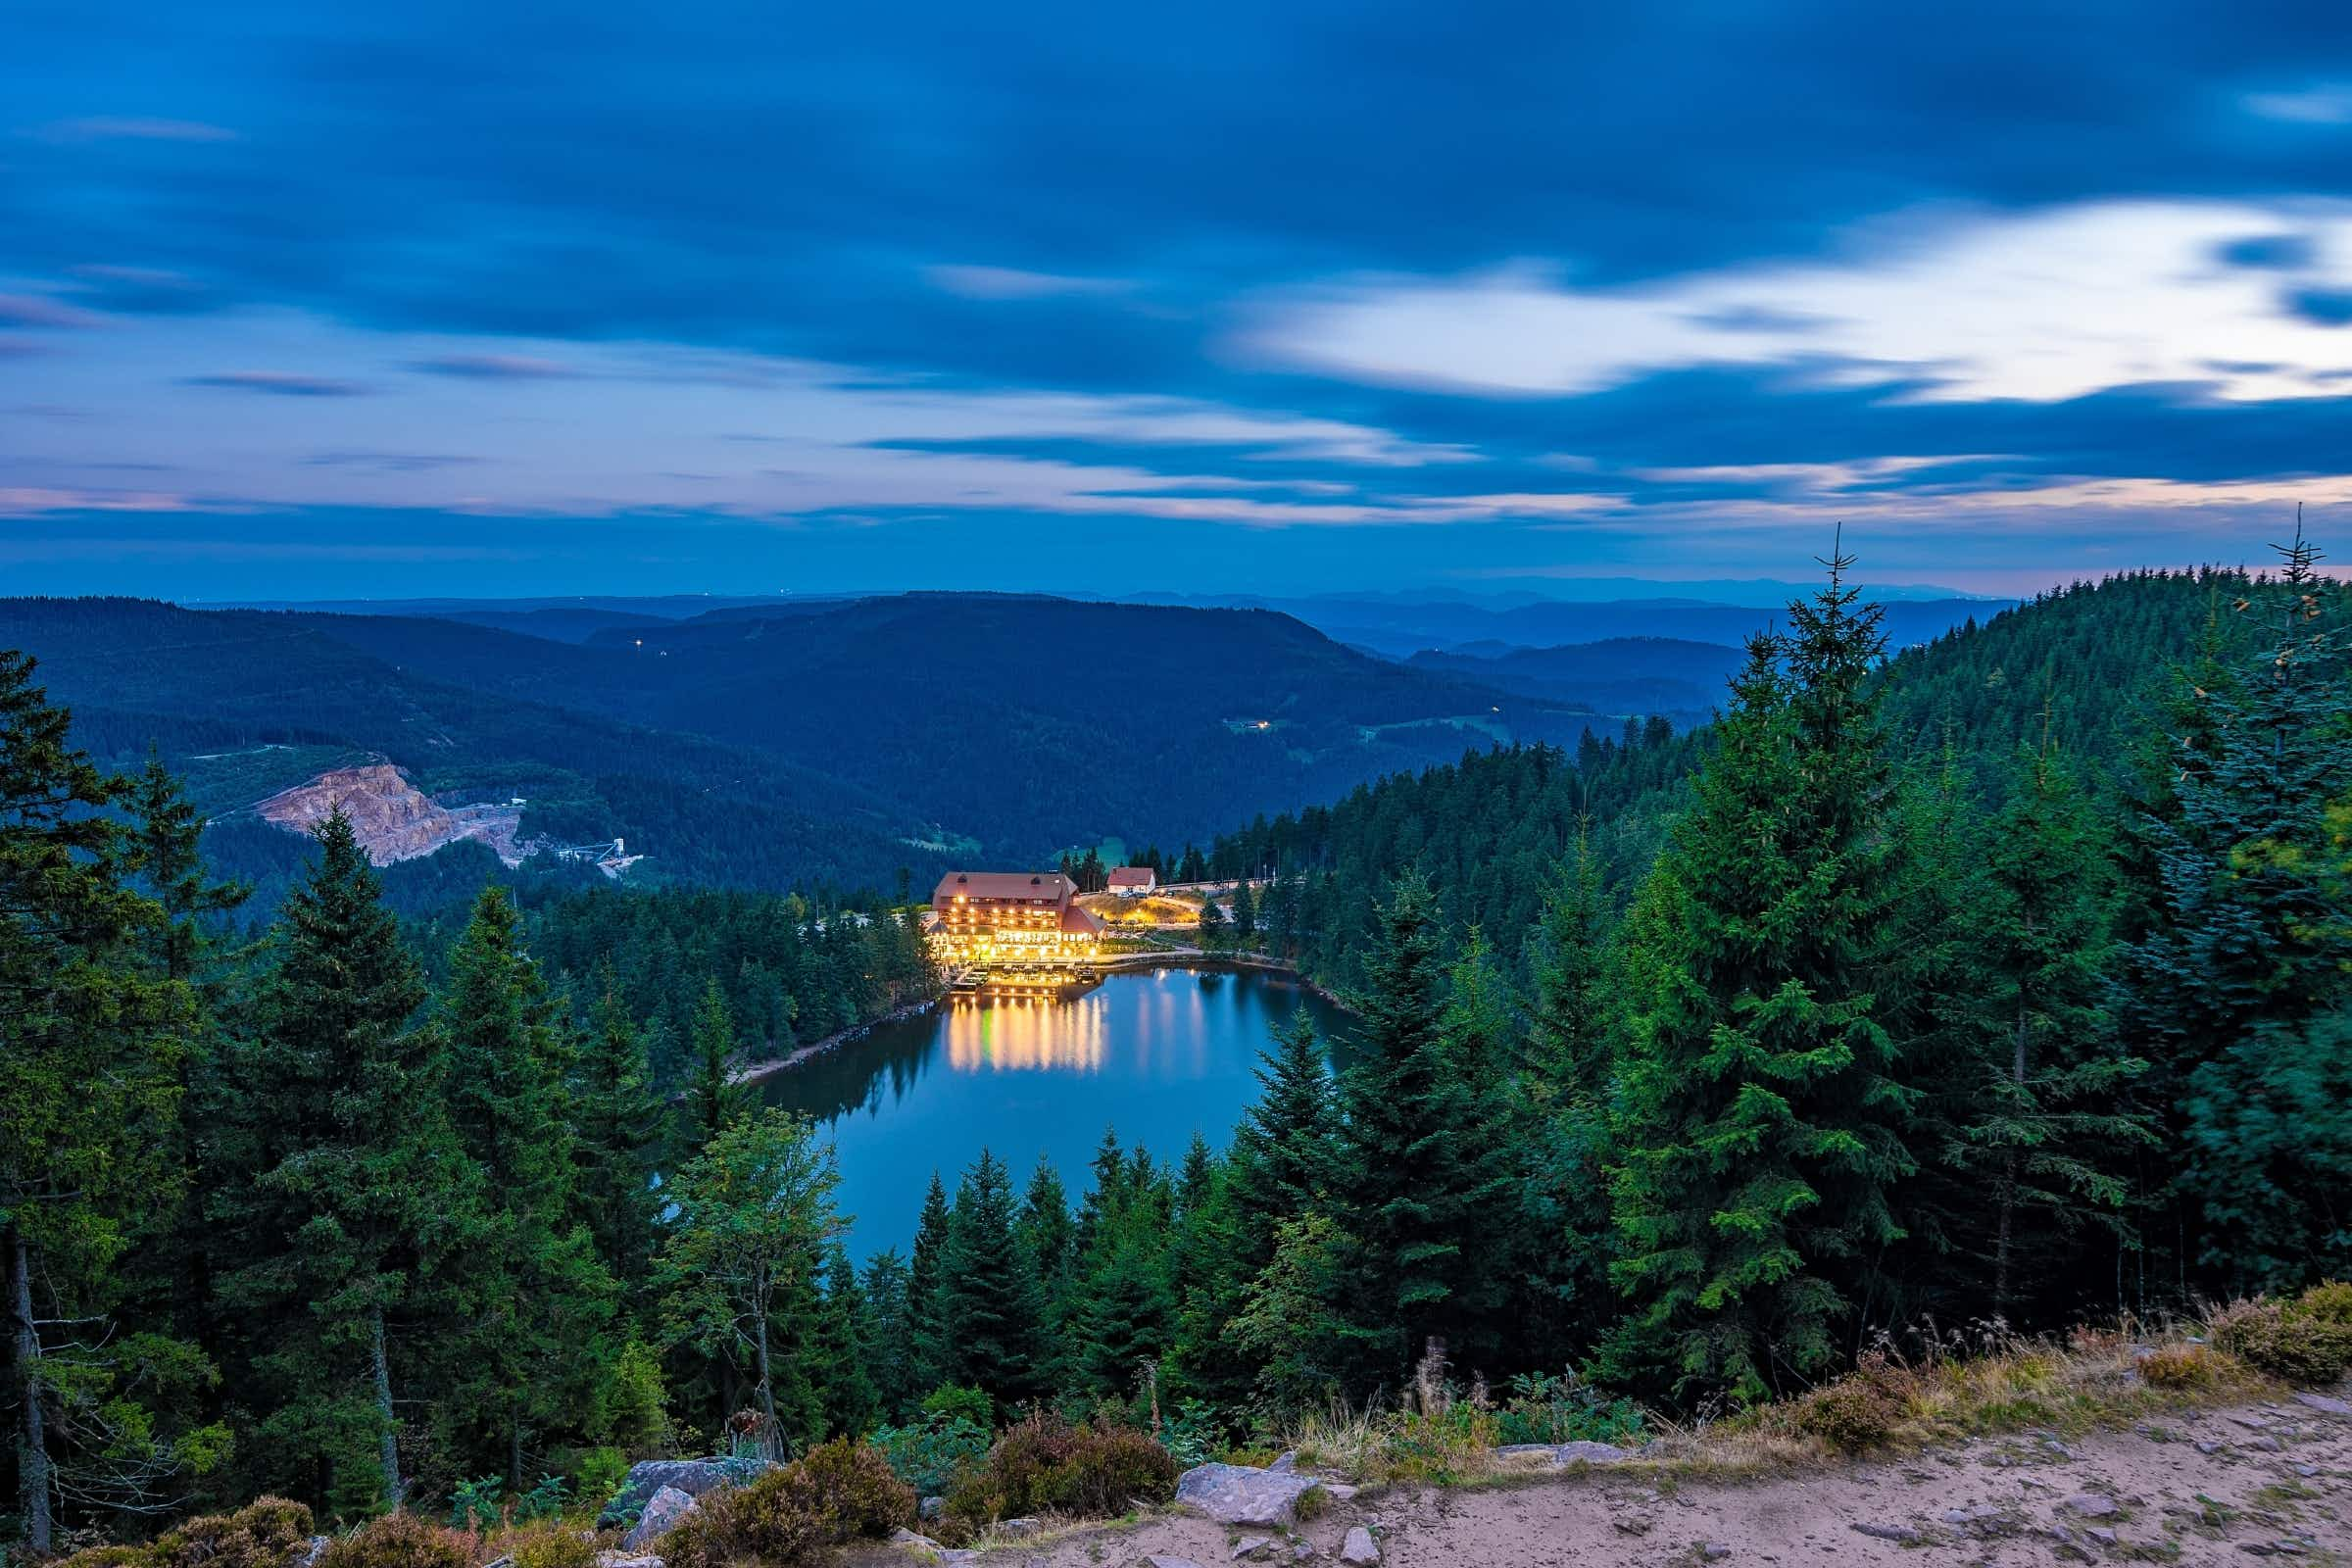 The Black Forest offers endless photo opportunities © Arthur Palmer/Shutterstock